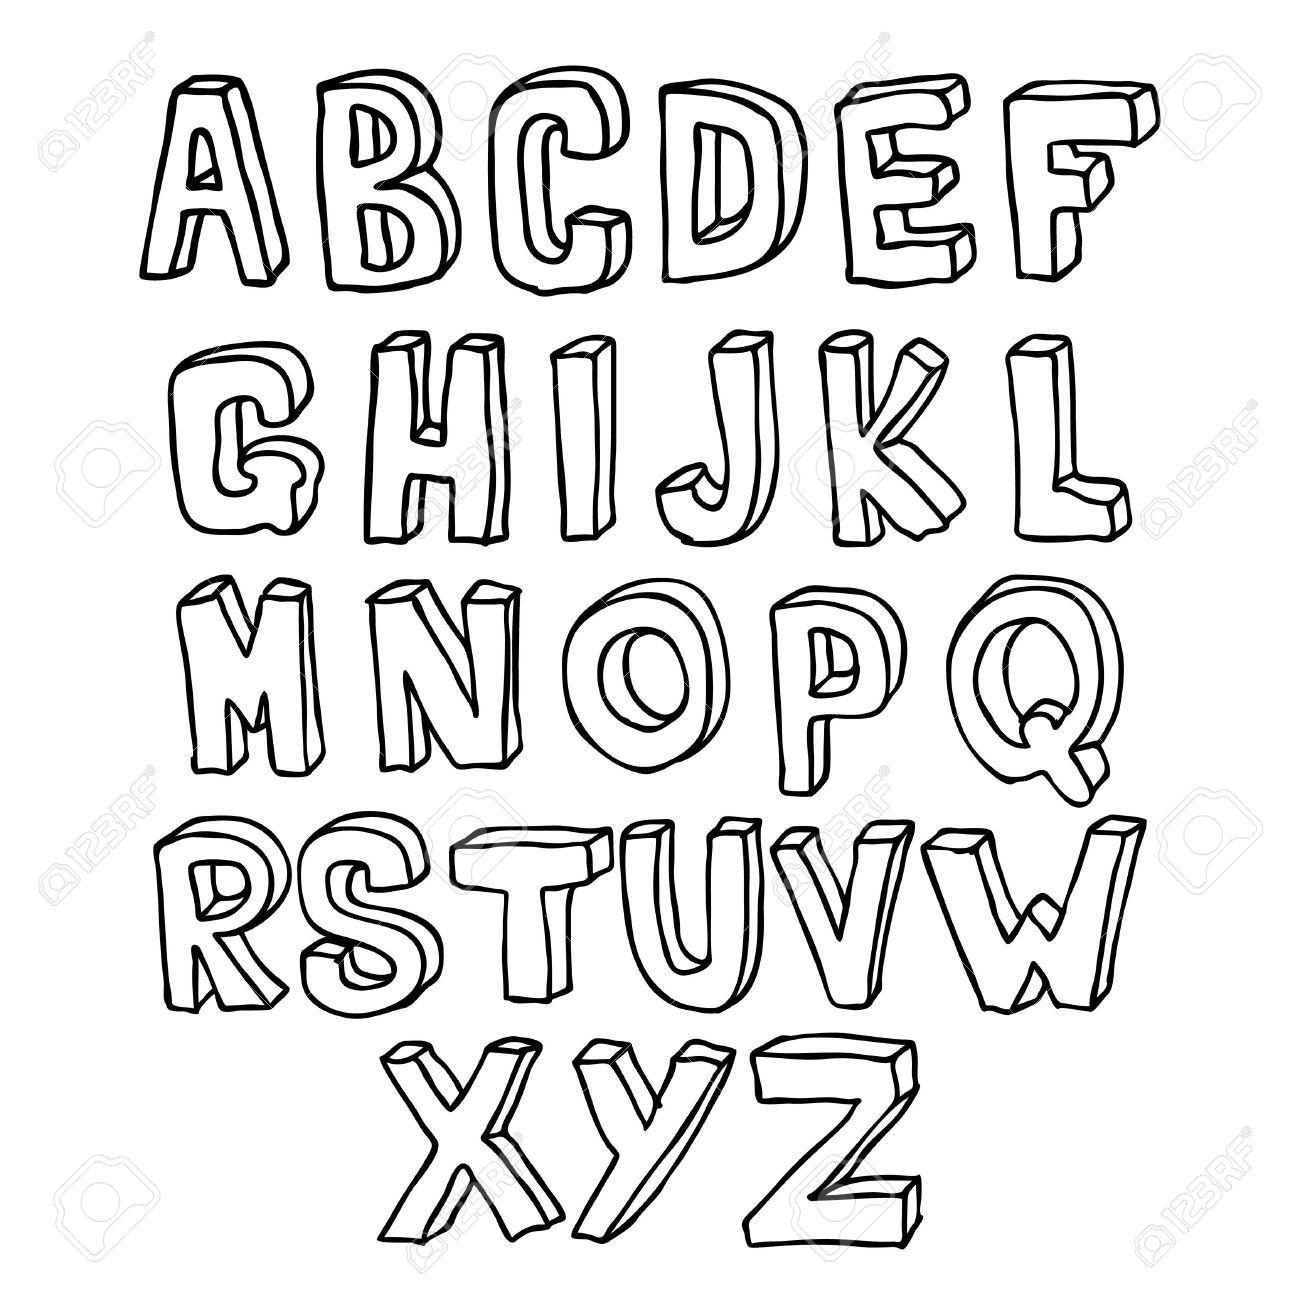 Hand Drawn Lettering 3d Inscricao Letras De Mao Do Alfabeto